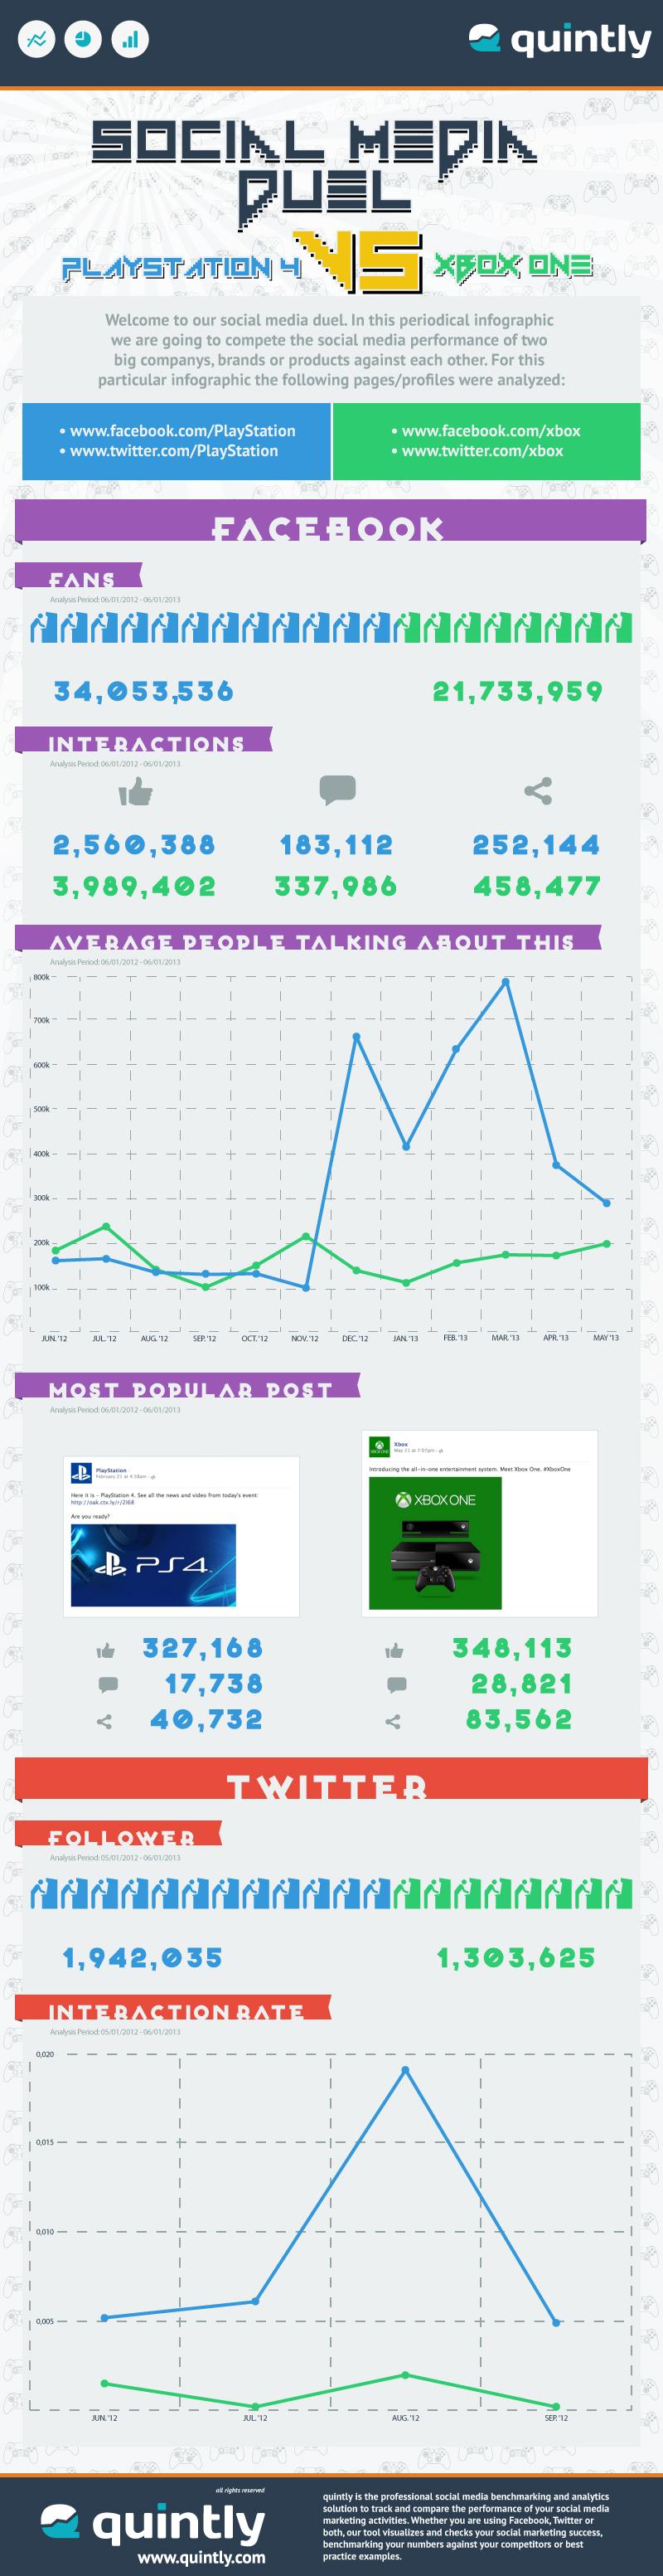 Social Media Duel Playstation 4 VS Xbox One